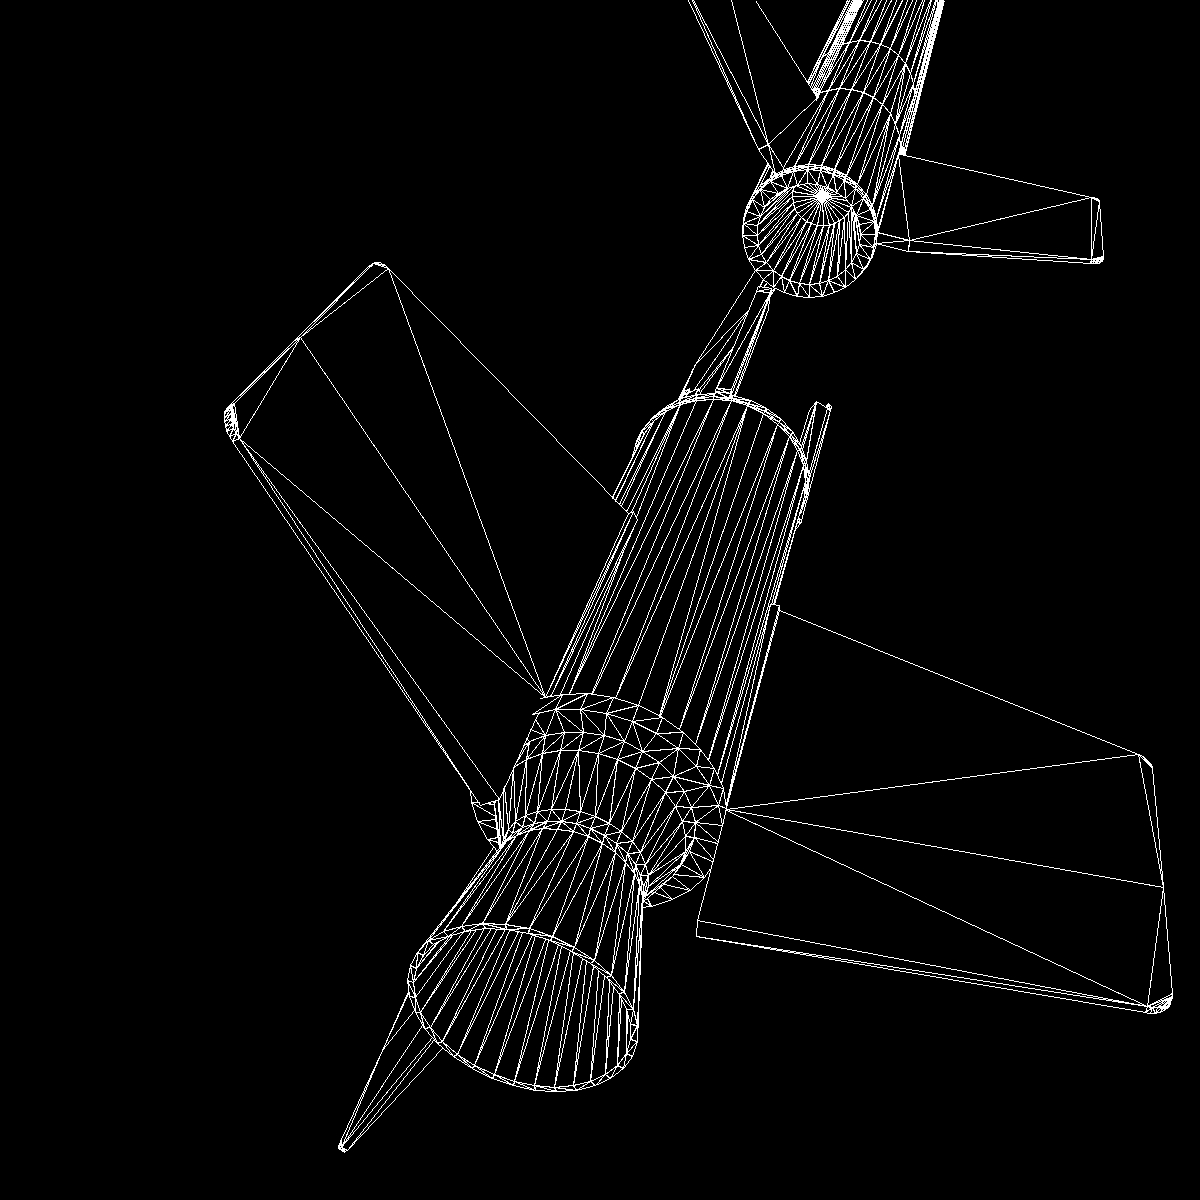 nasa aerobee 100 rocket 3d model 3ds dxf fbx blend cob dae x  obj 158445